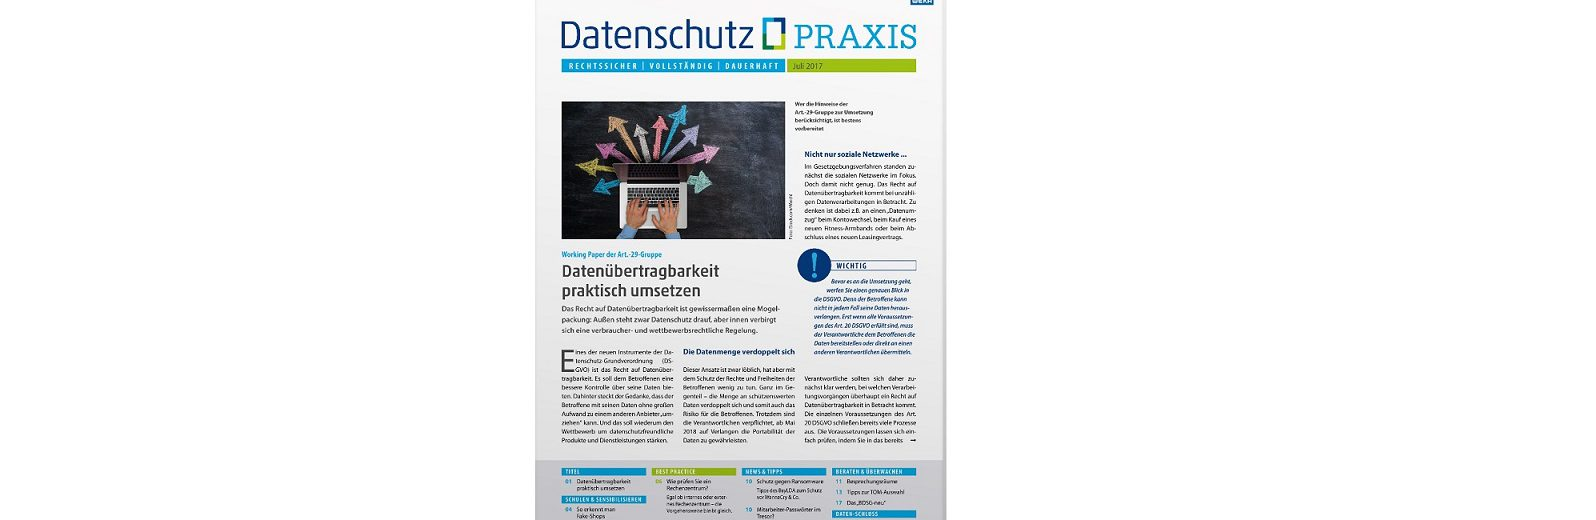 Modern, strukturiert, frisch: Datenschutz PRAXIS im neuen Outfit